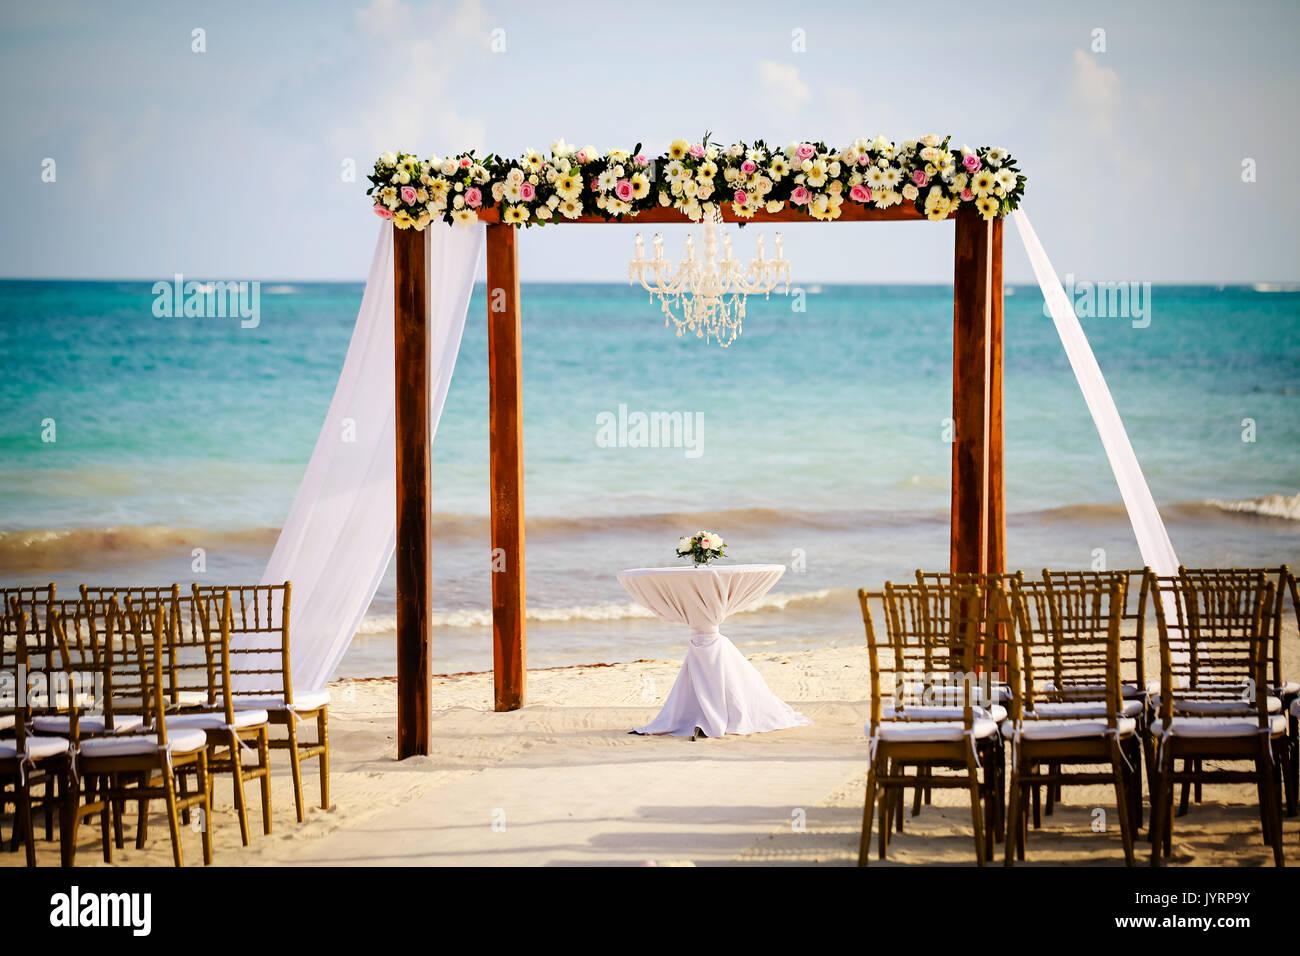 Caribbean Destination Weddings: Wedding Cuba Stock Photos & Wedding Cuba Stock Images